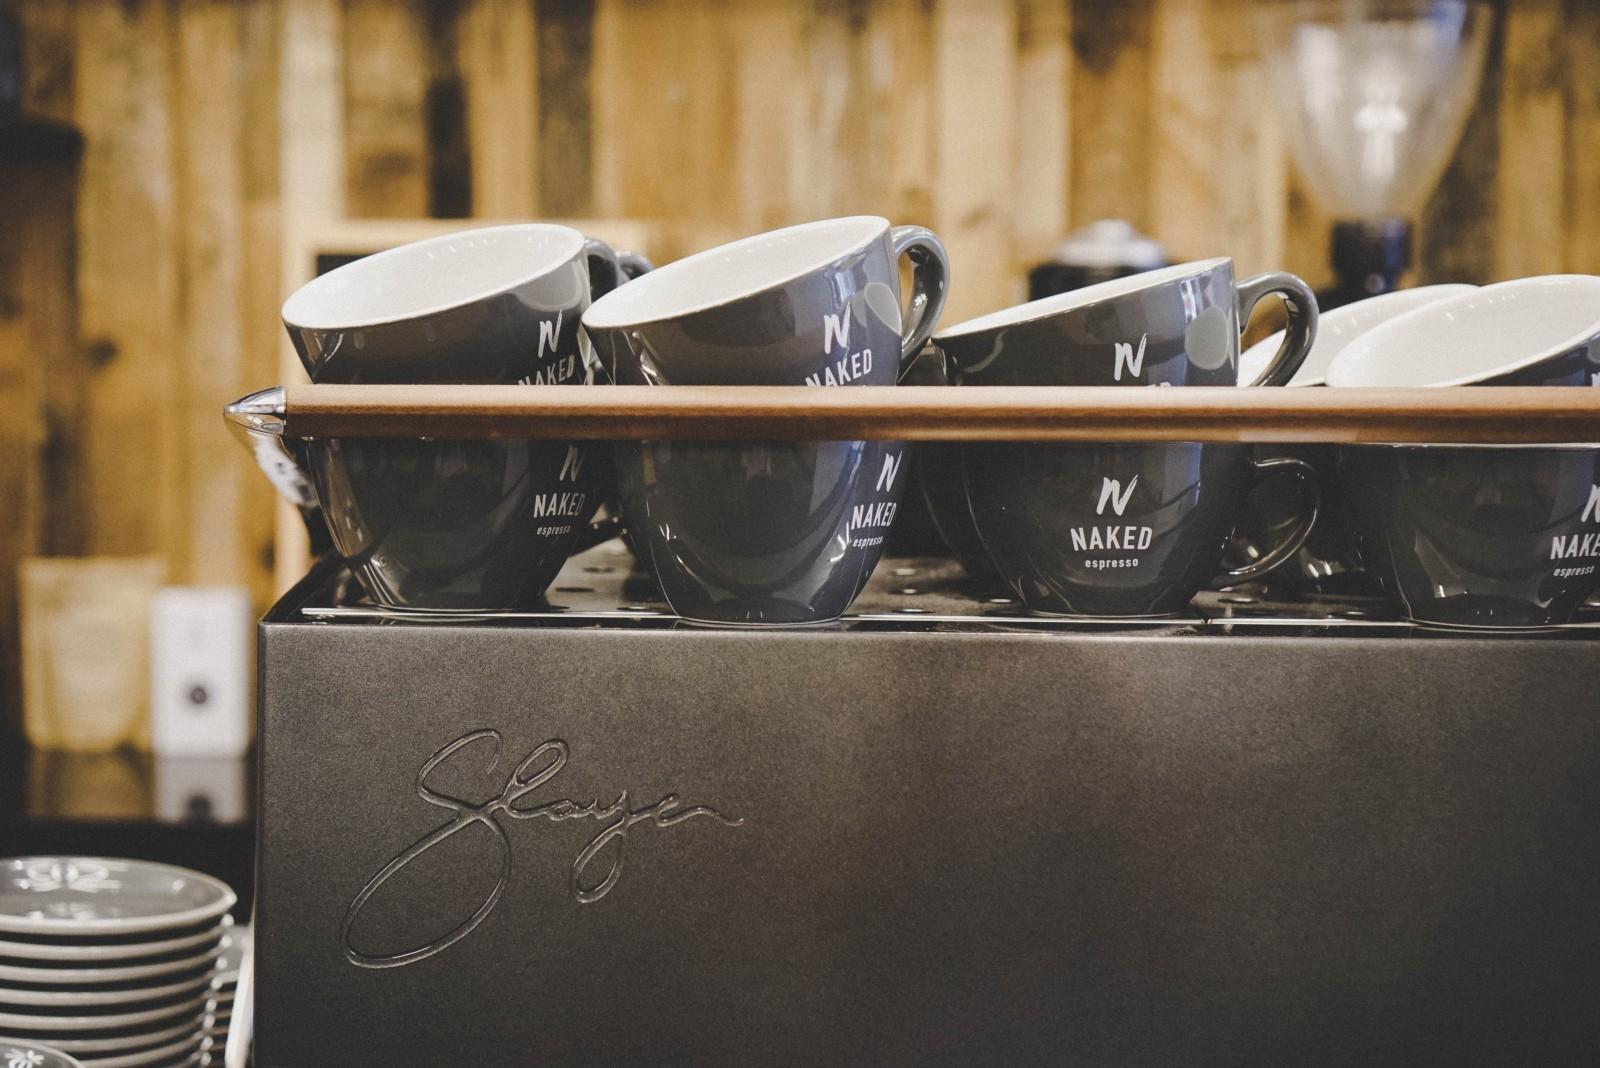 NAKED Espresso Amsterdam